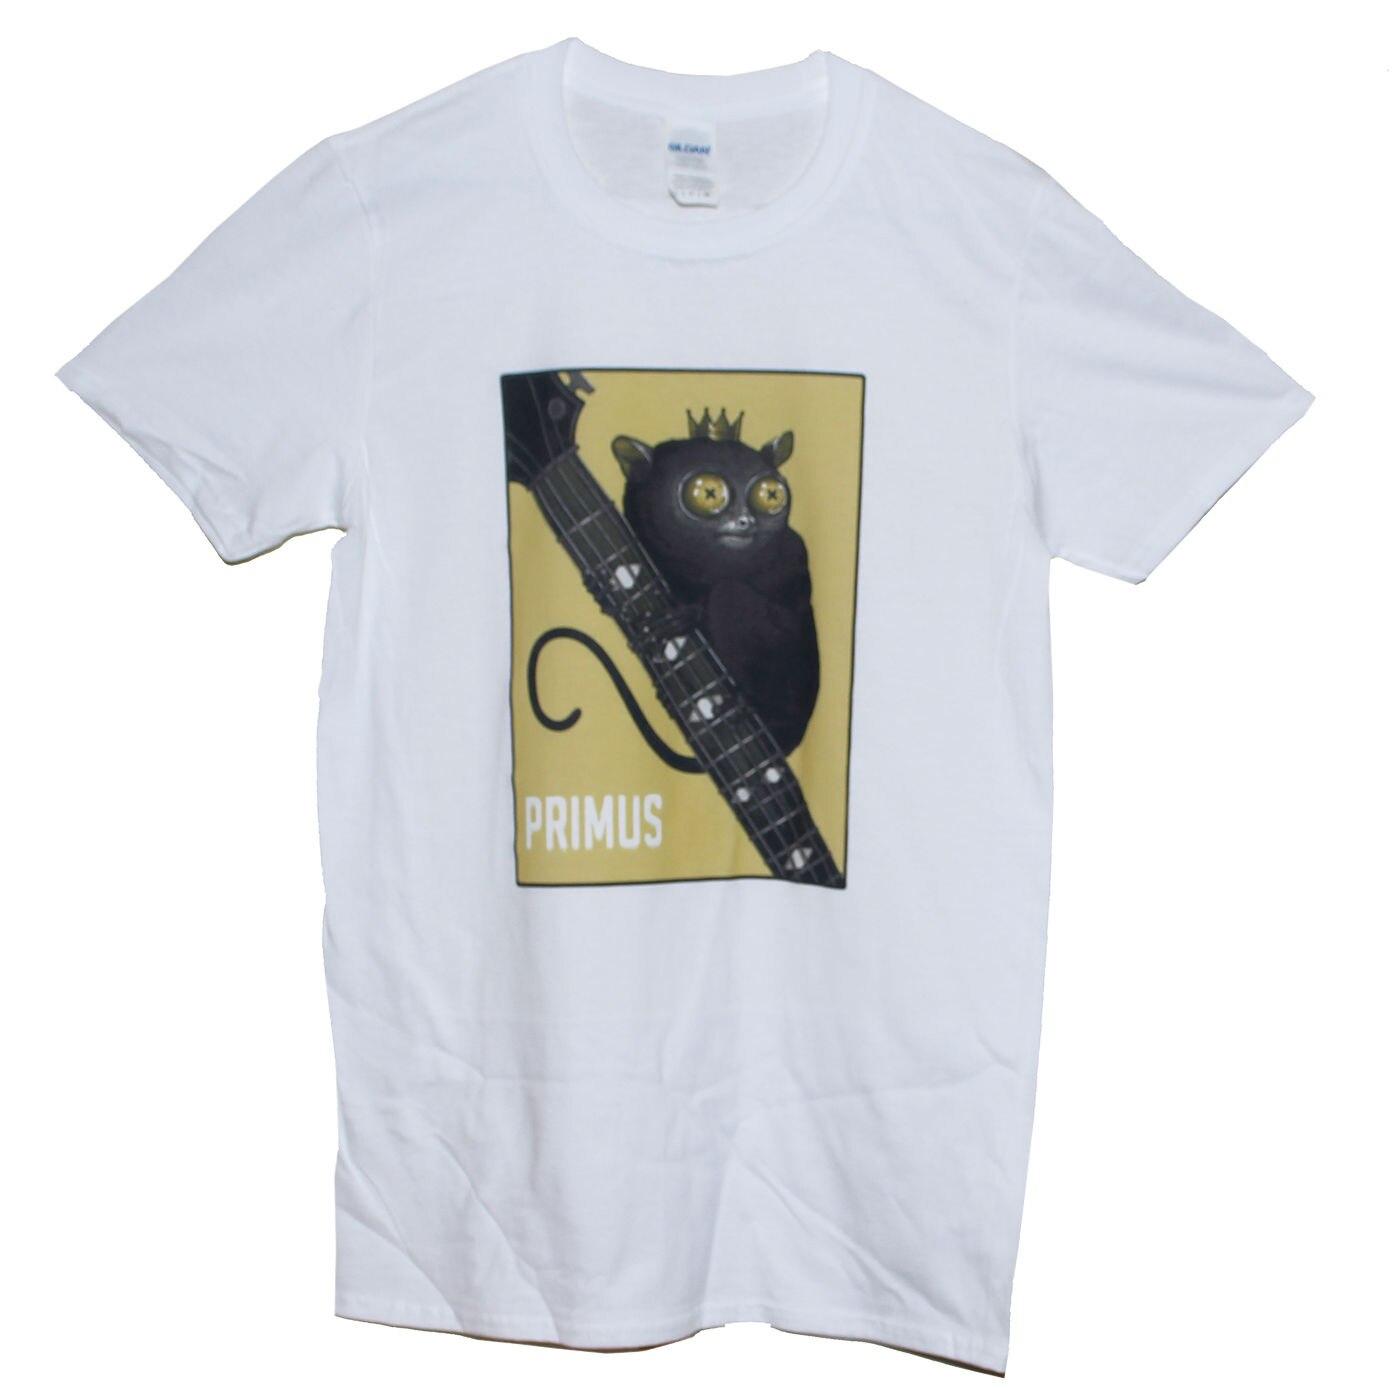 a52772d2 PRIMUS T SHIRT Metal Punk Rock Clutch Weezer Graphic Band Tee Size S M L XL  XXL image